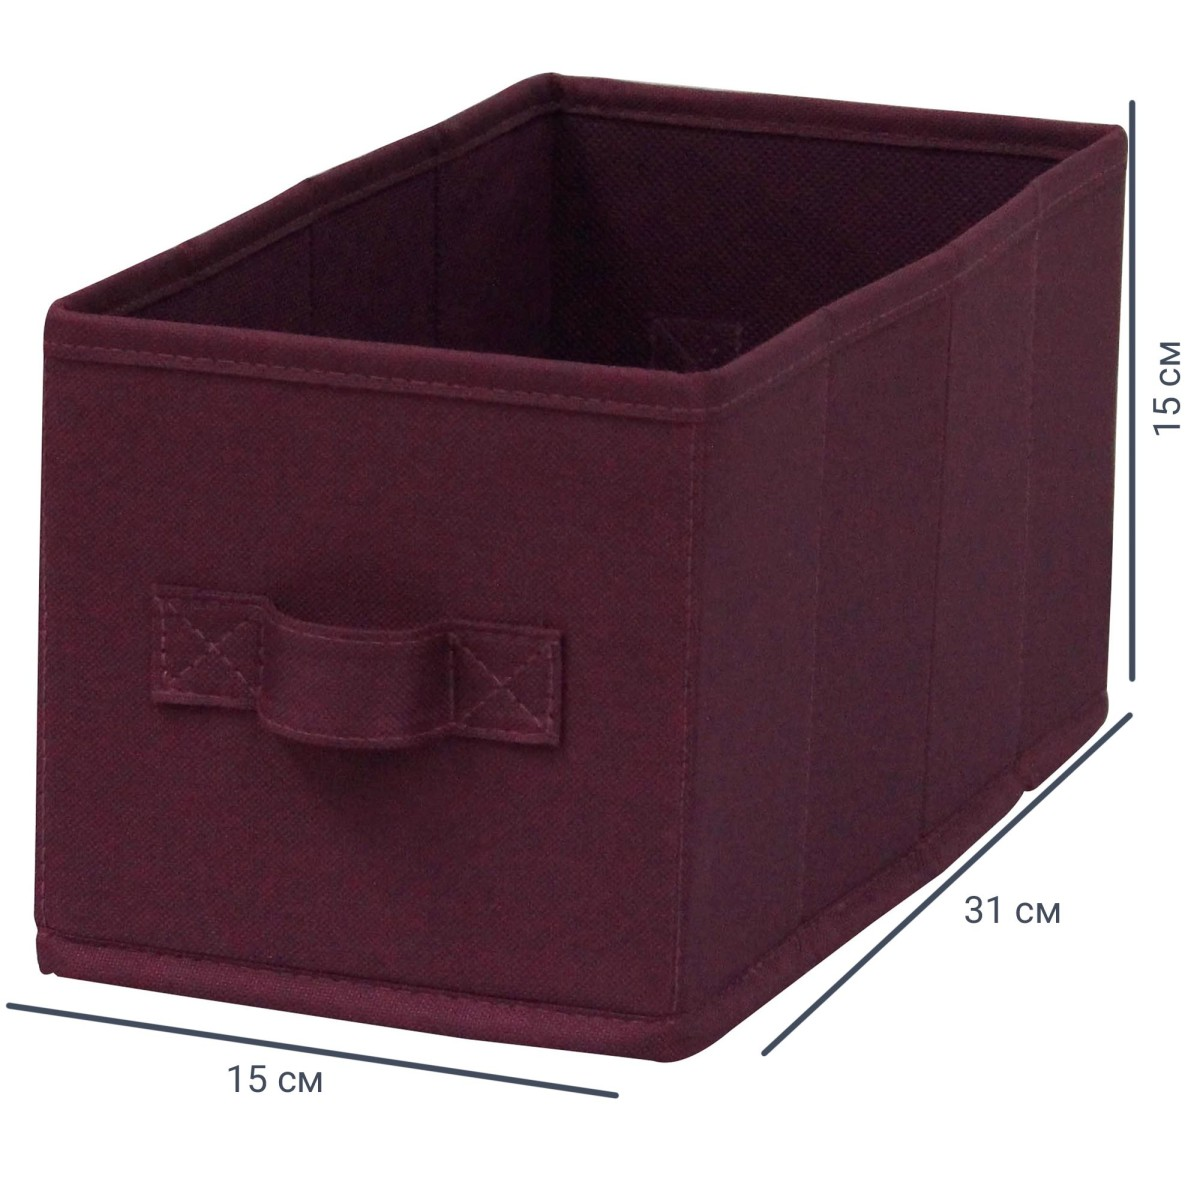 Короб Spaceo Berry 15х31х15 см 6.9 л полиэстер цвет черничный